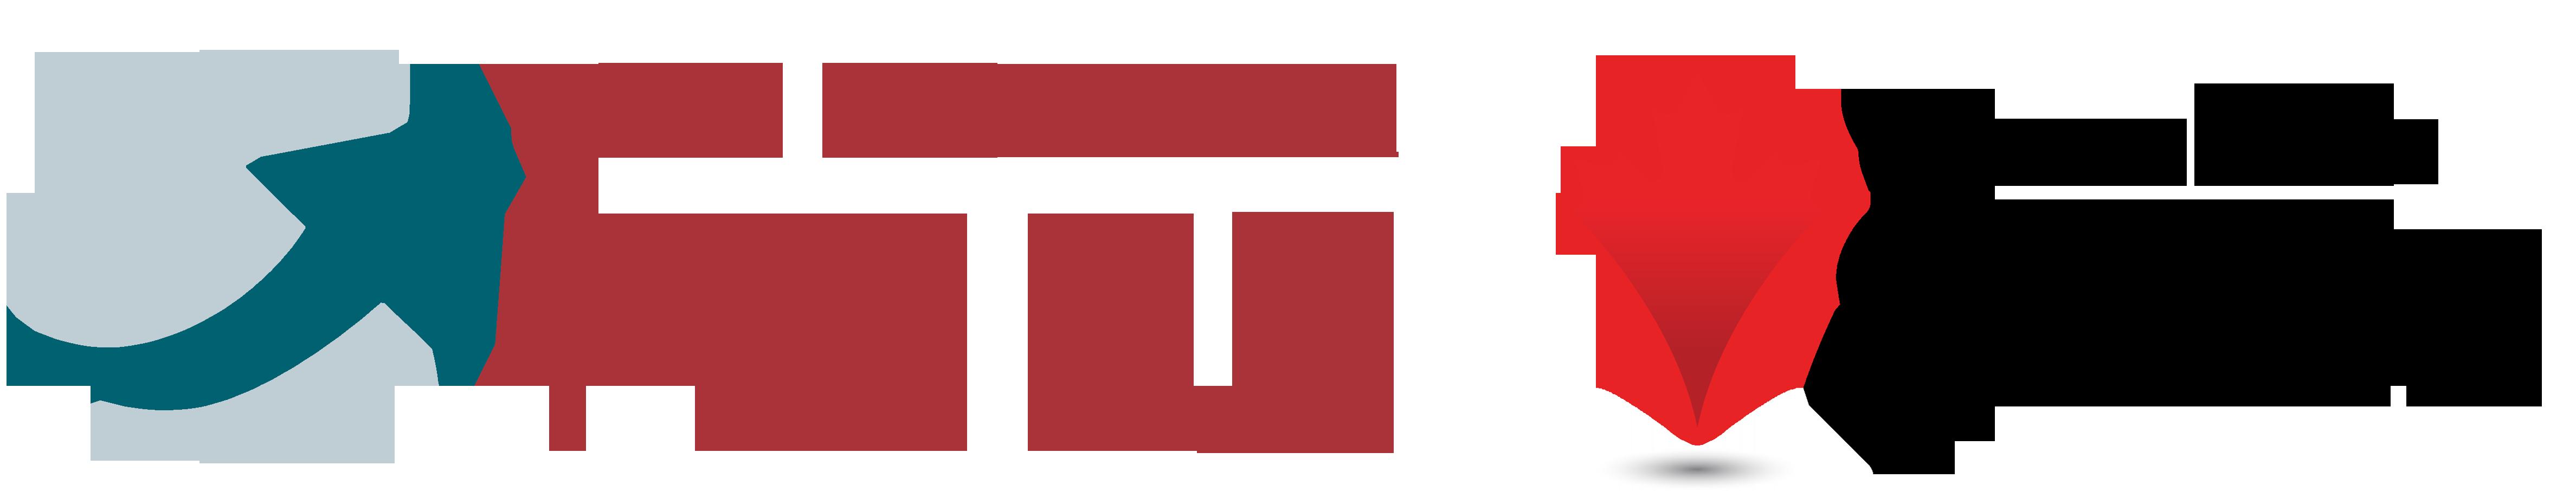 USA Gap Year Fairs - Canadian Gap Year Association - Logos